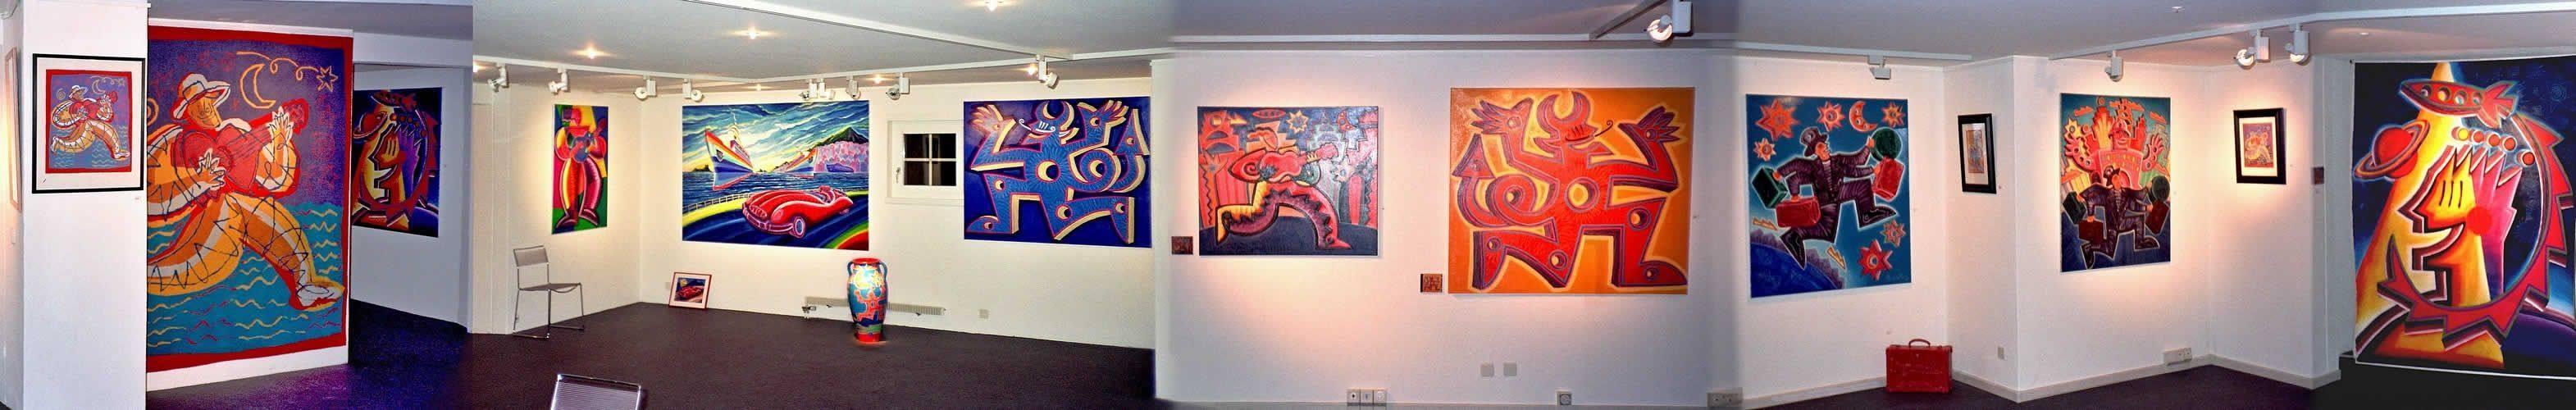 Thema Gallery 2